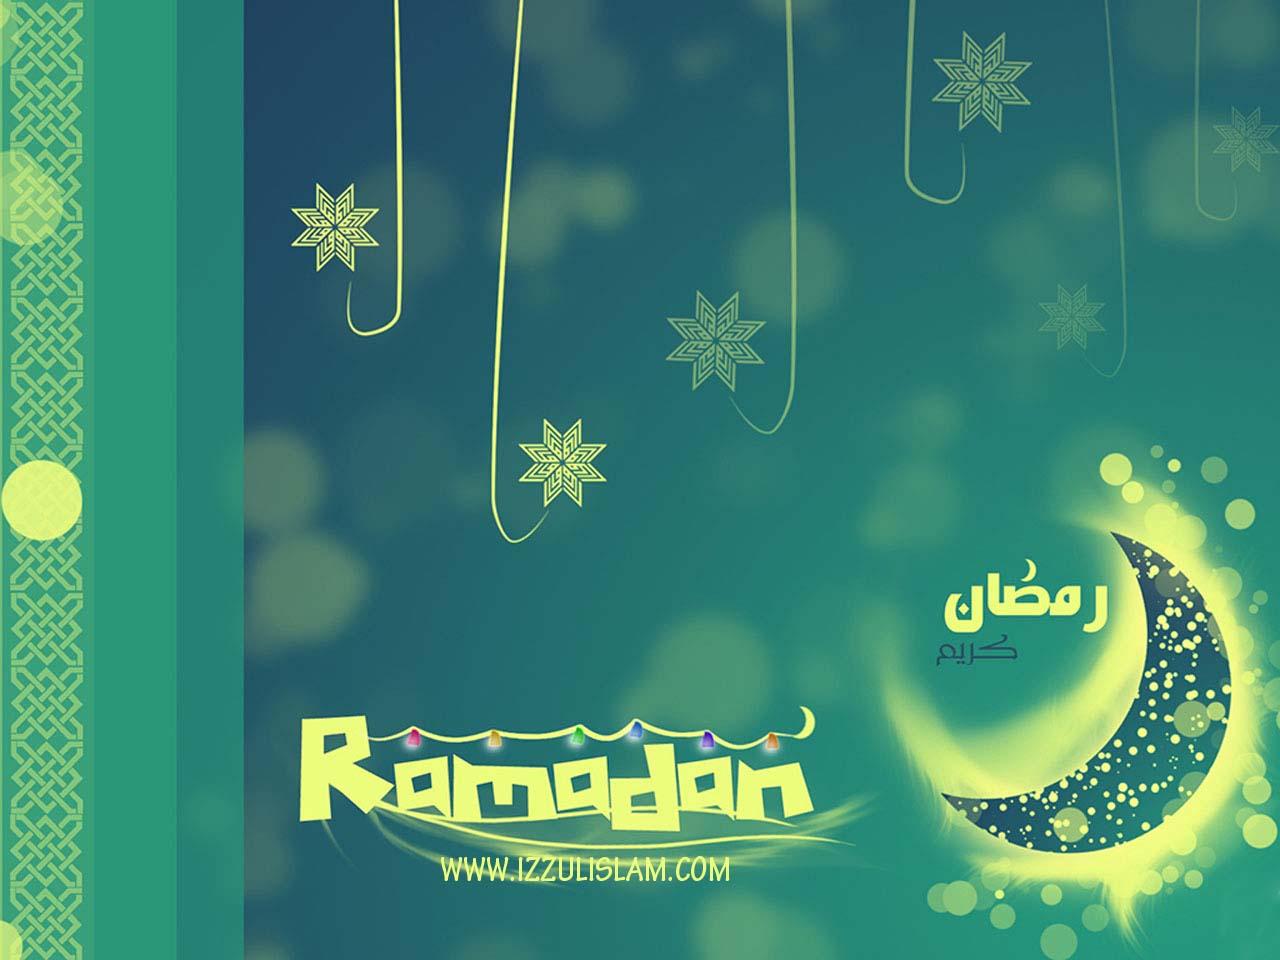 DP BBM Kata Kata Ramadhan Bulan Suci Ramadhan wallpaper HP foto Ramadhan Kartu Ucapan Selamat Ramadhan ramadhan terbaru DP BBM Kata Kata Ramadhan Bulan Suci Ramadhan wallpaper HP foto Ramadhan Kartu Ucapan Selamat Ramadhan ramadhan bergerak